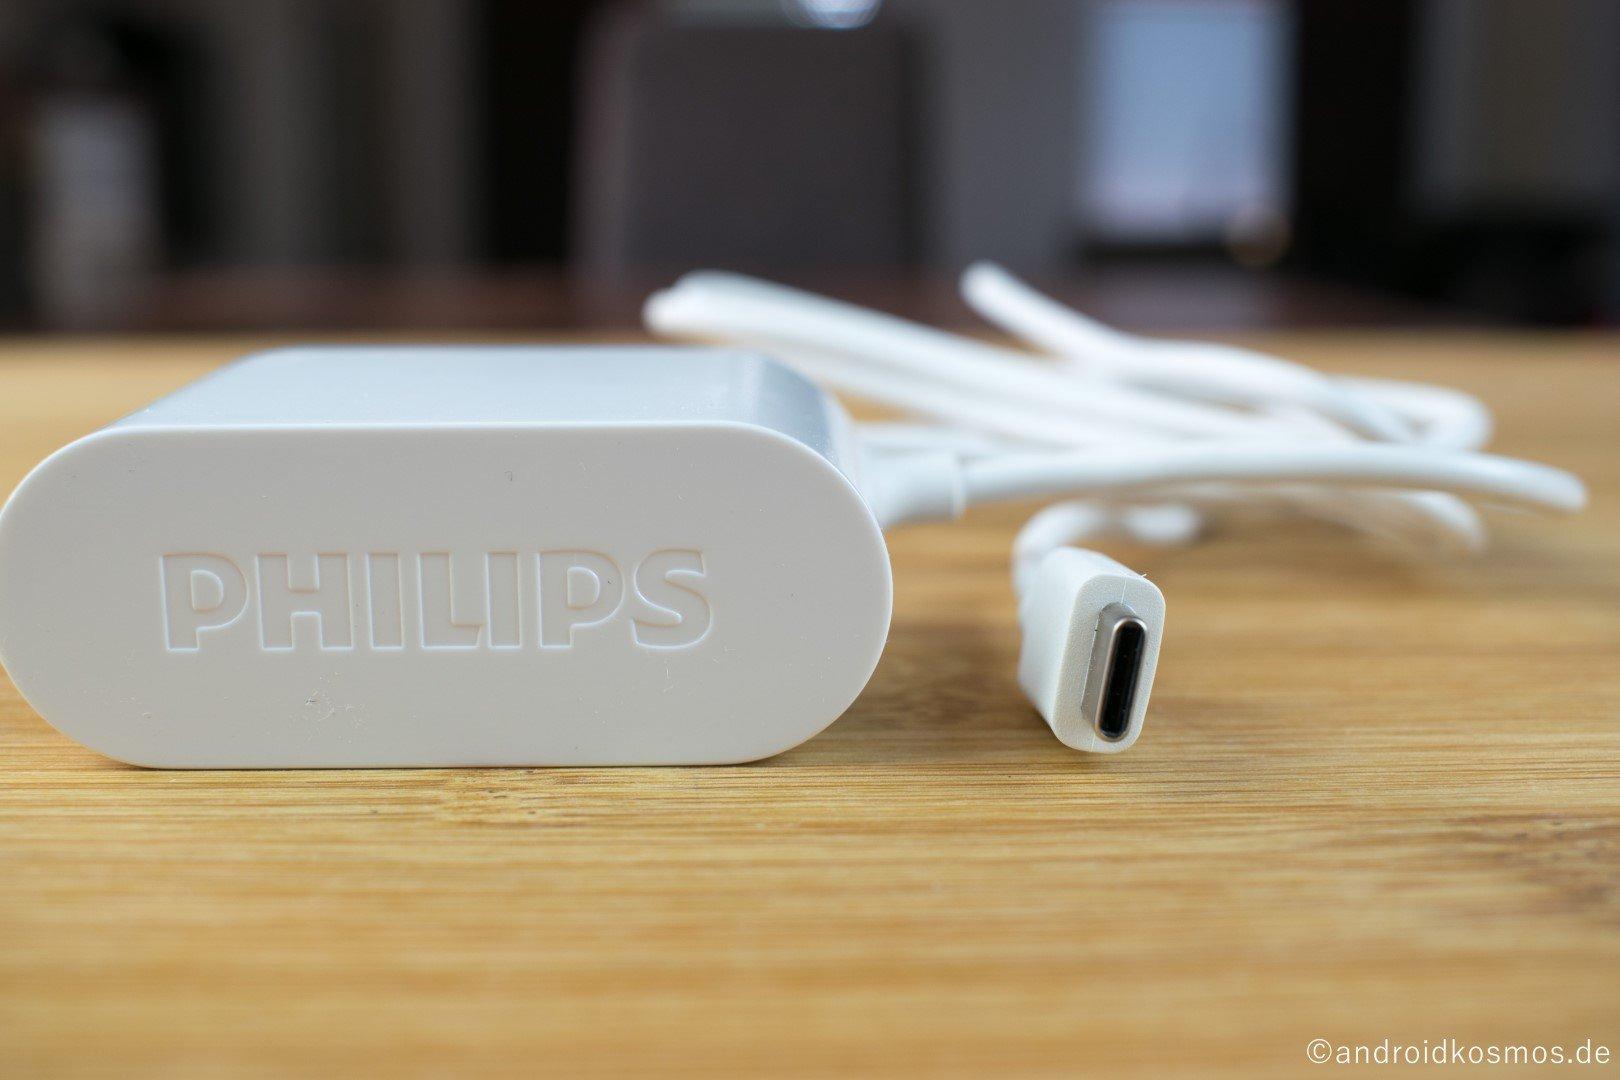 Philips Zhirui AndroidKosmos.de 3640